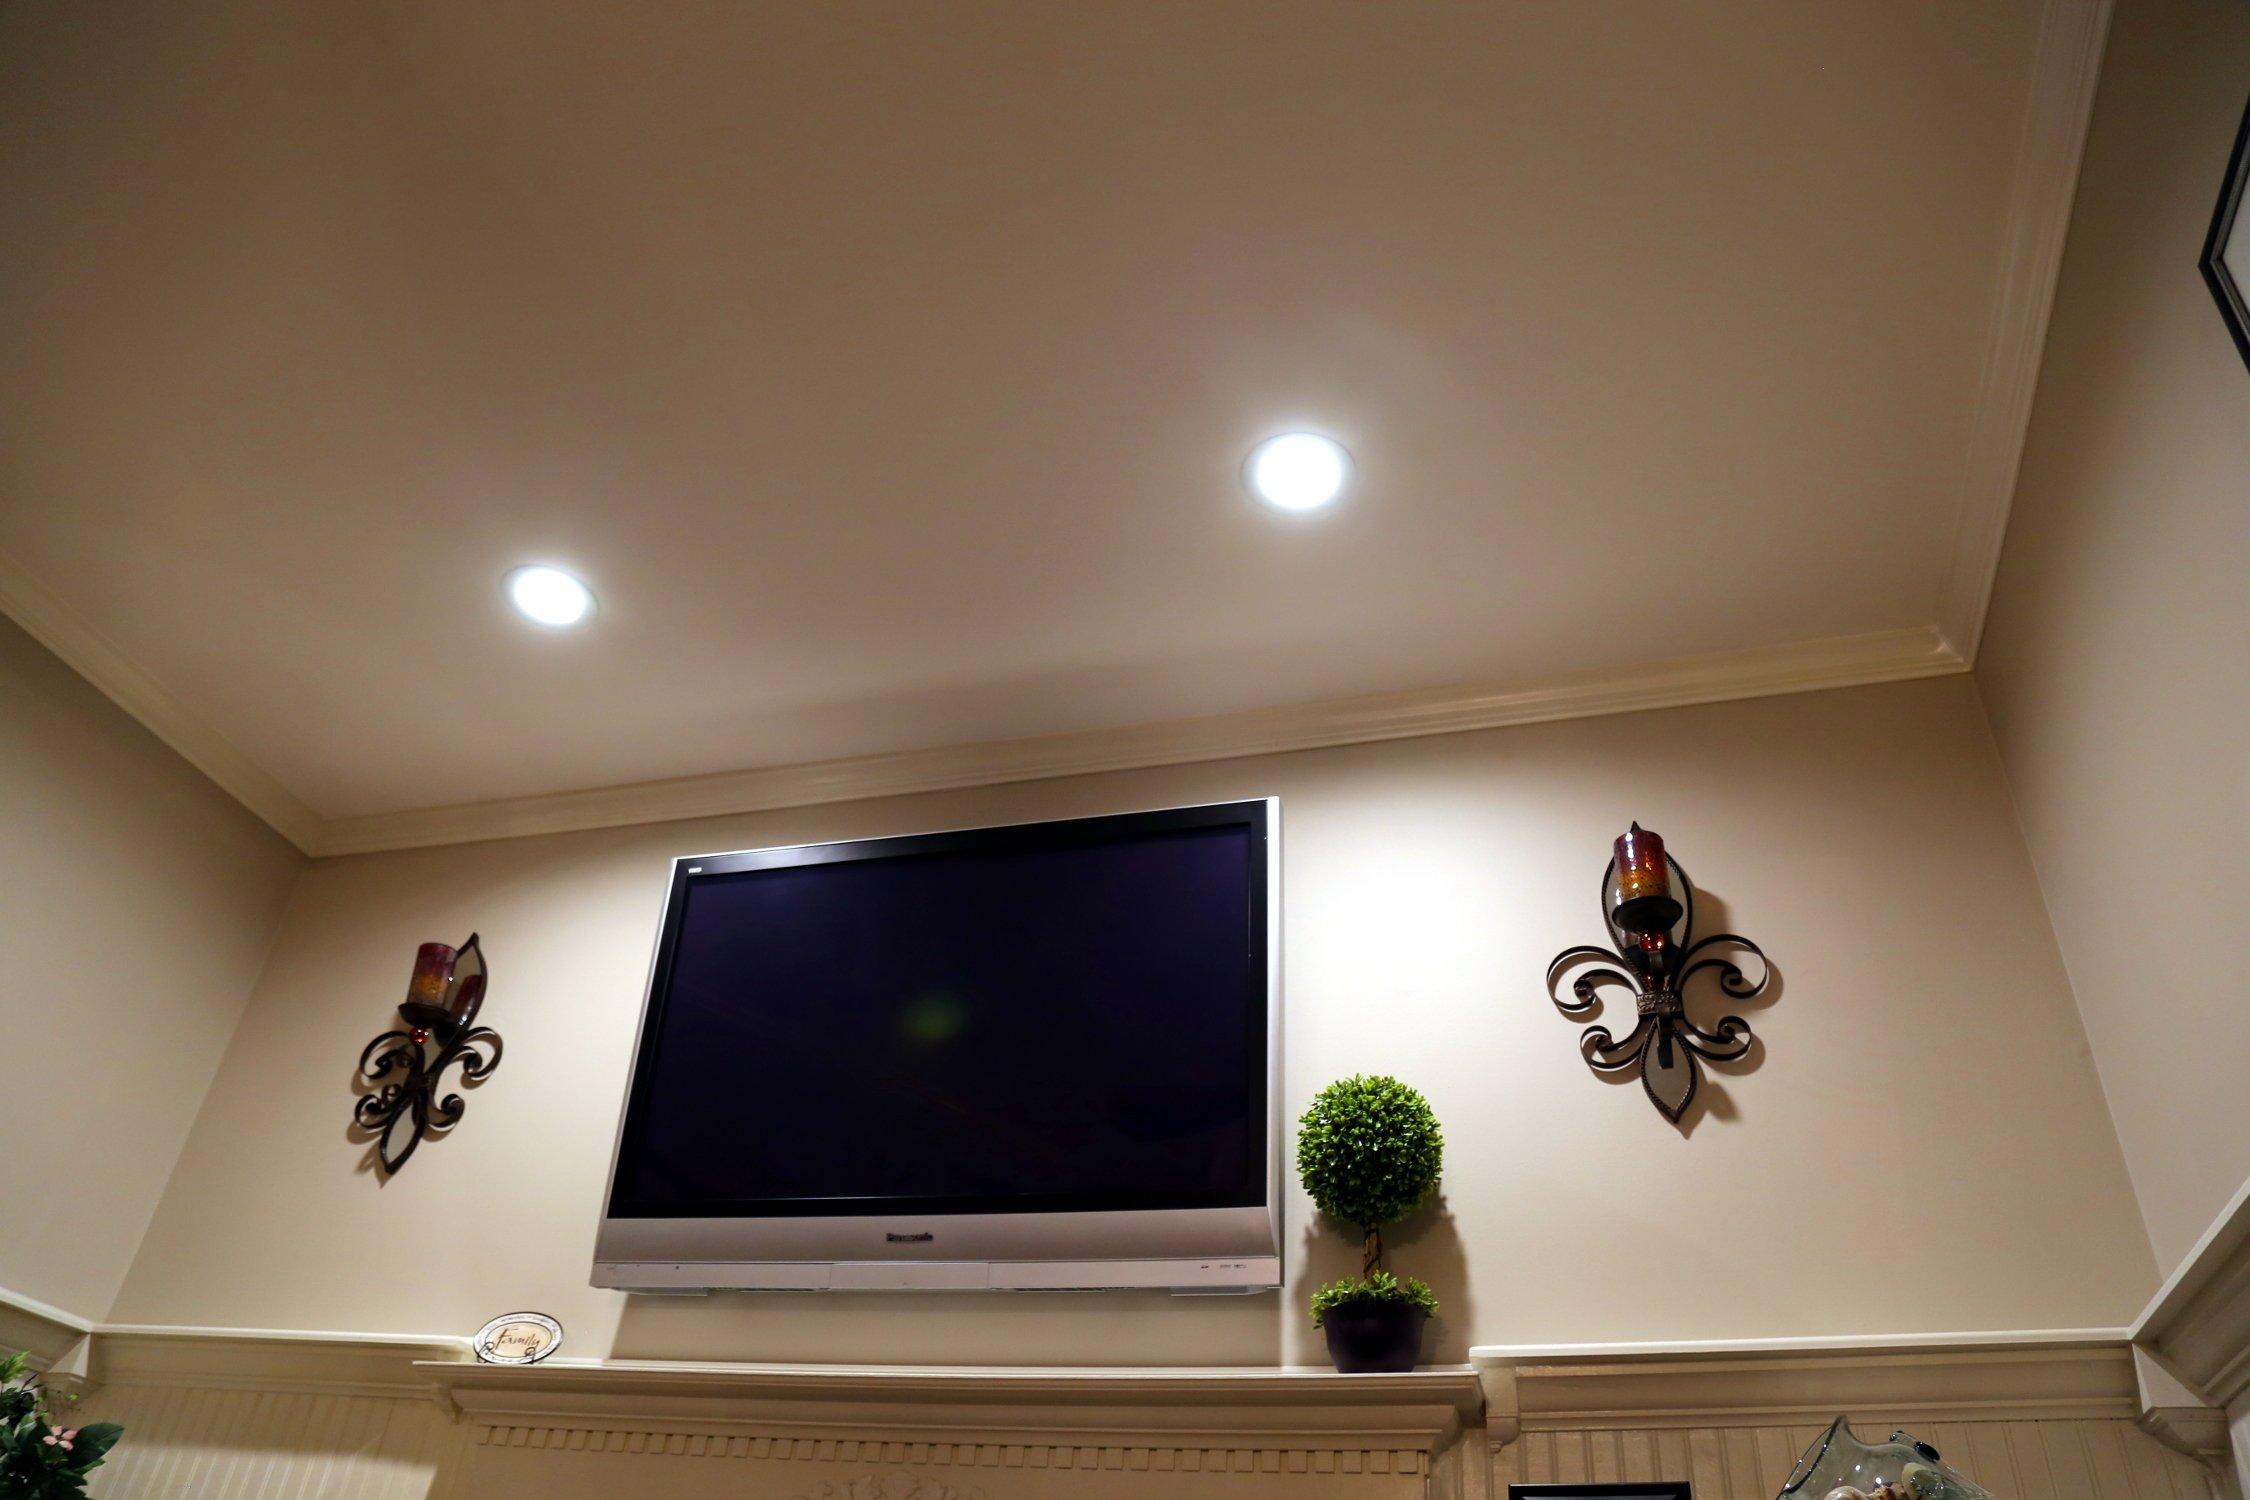 TV room electrician in Crofton